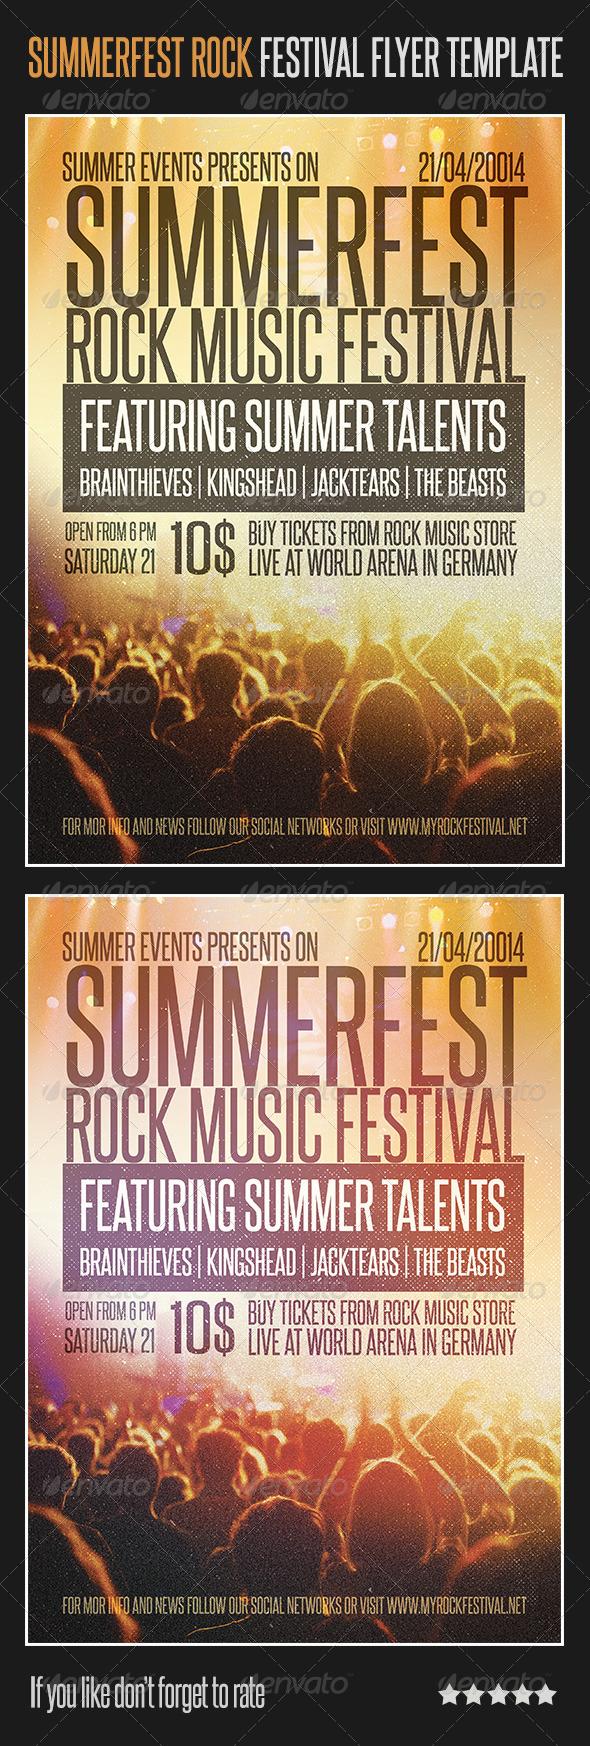 GraphicRiver Summerfest Rock Festival Flyer Template 6818521